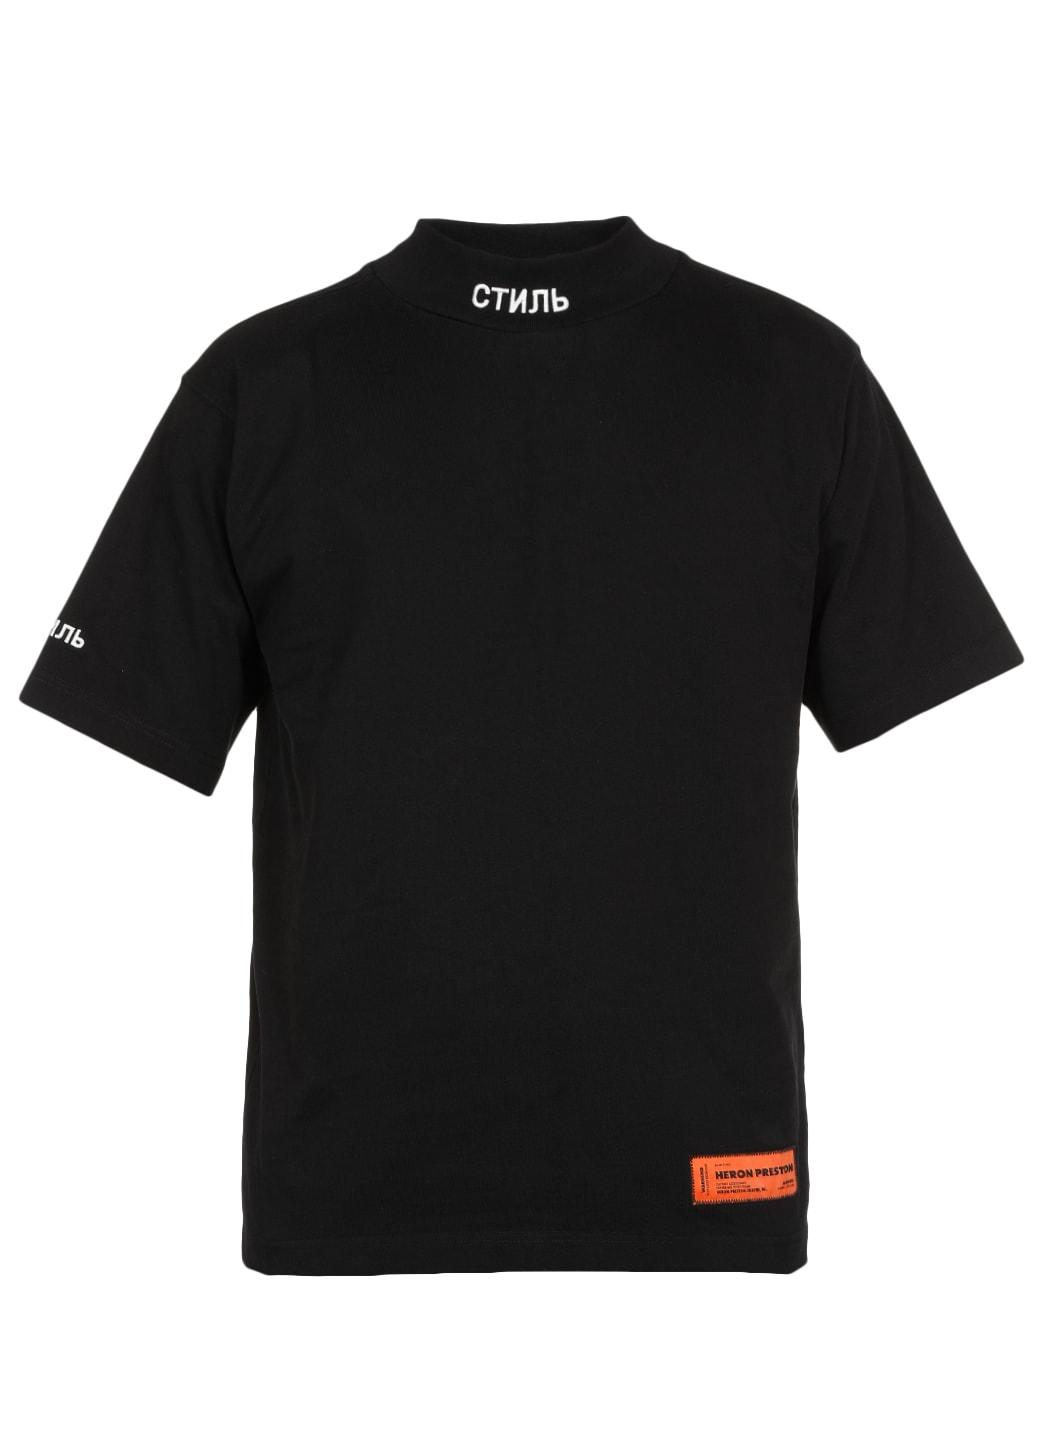 Heron Preston Cotton T-shirt In Black White